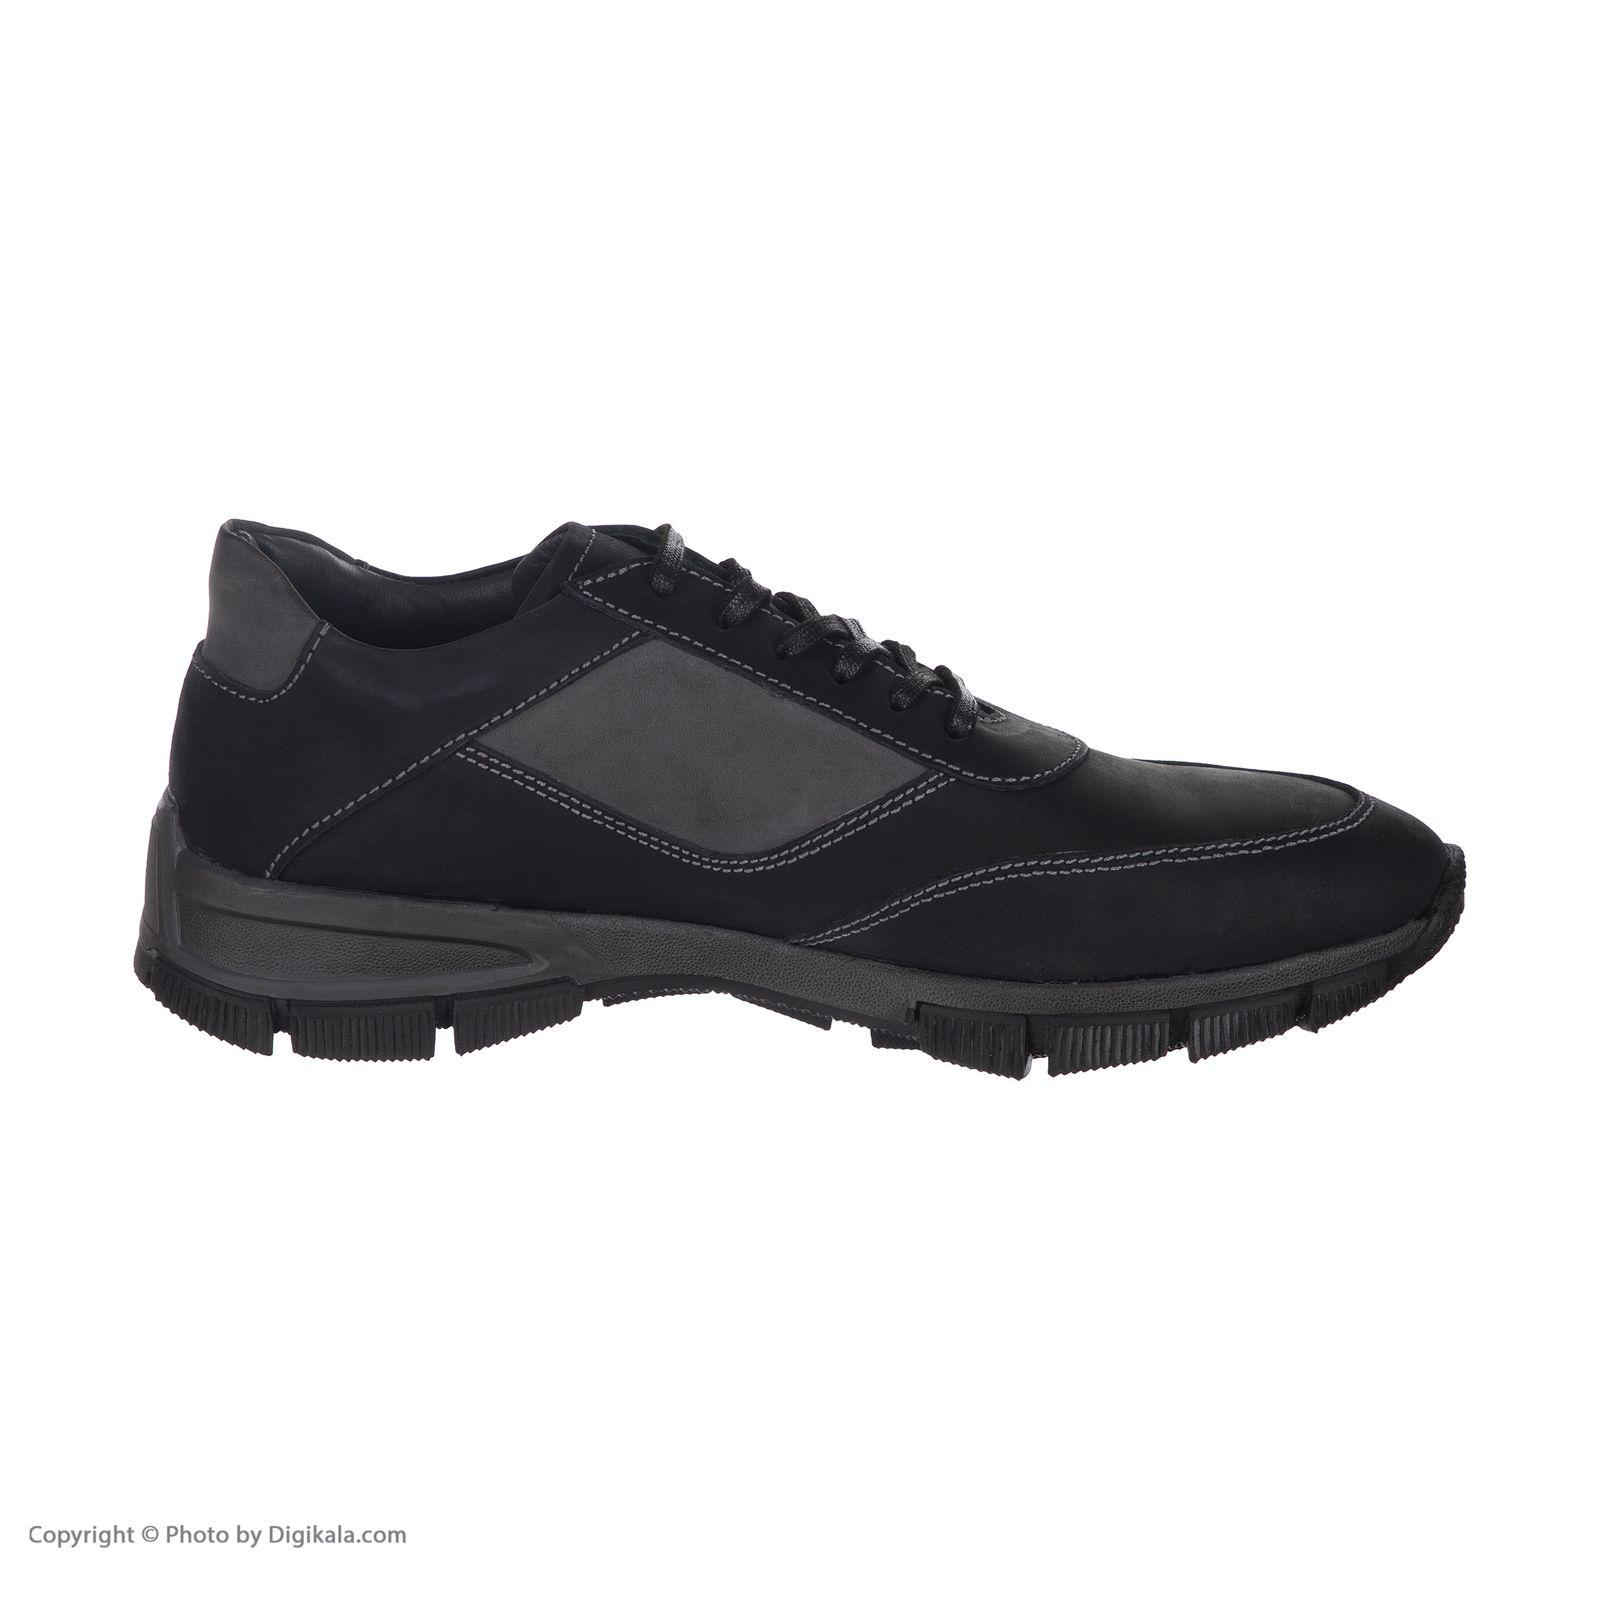 کفش روزمره مردانه دانادل مدل 8604C503101 -  - 4